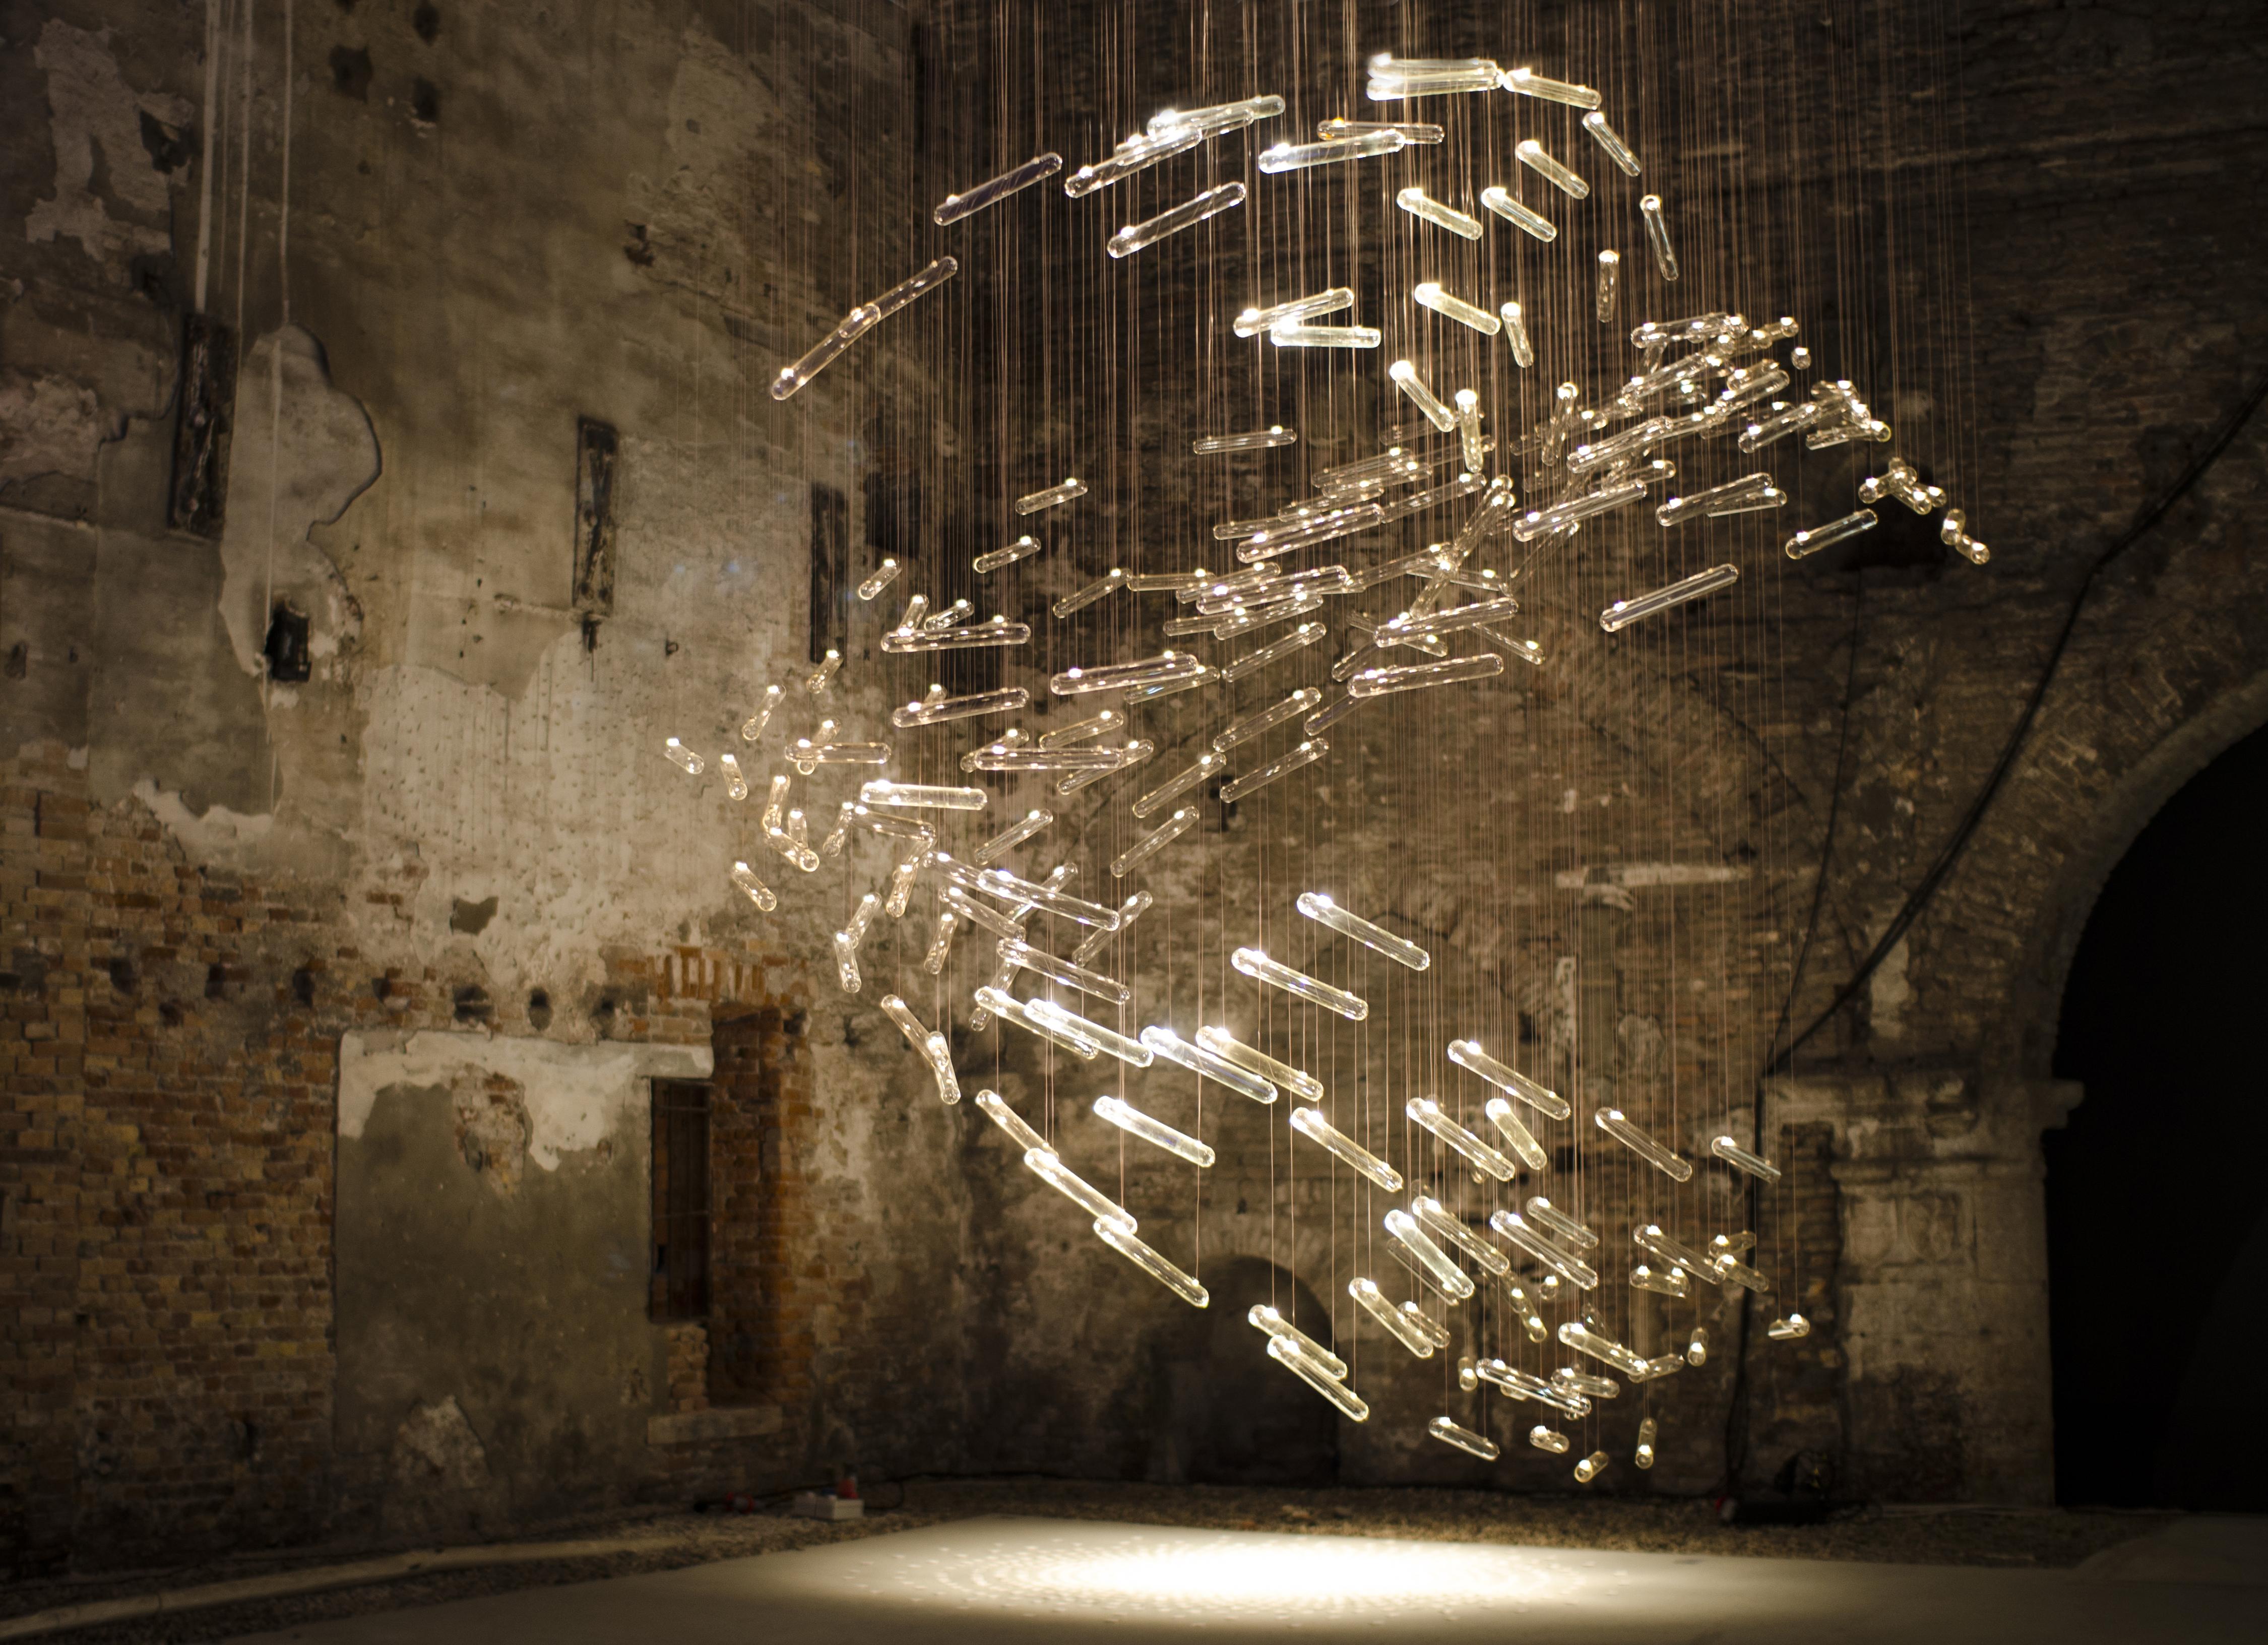 Studio_Drift__Flylight_at_Arsenale_Venice